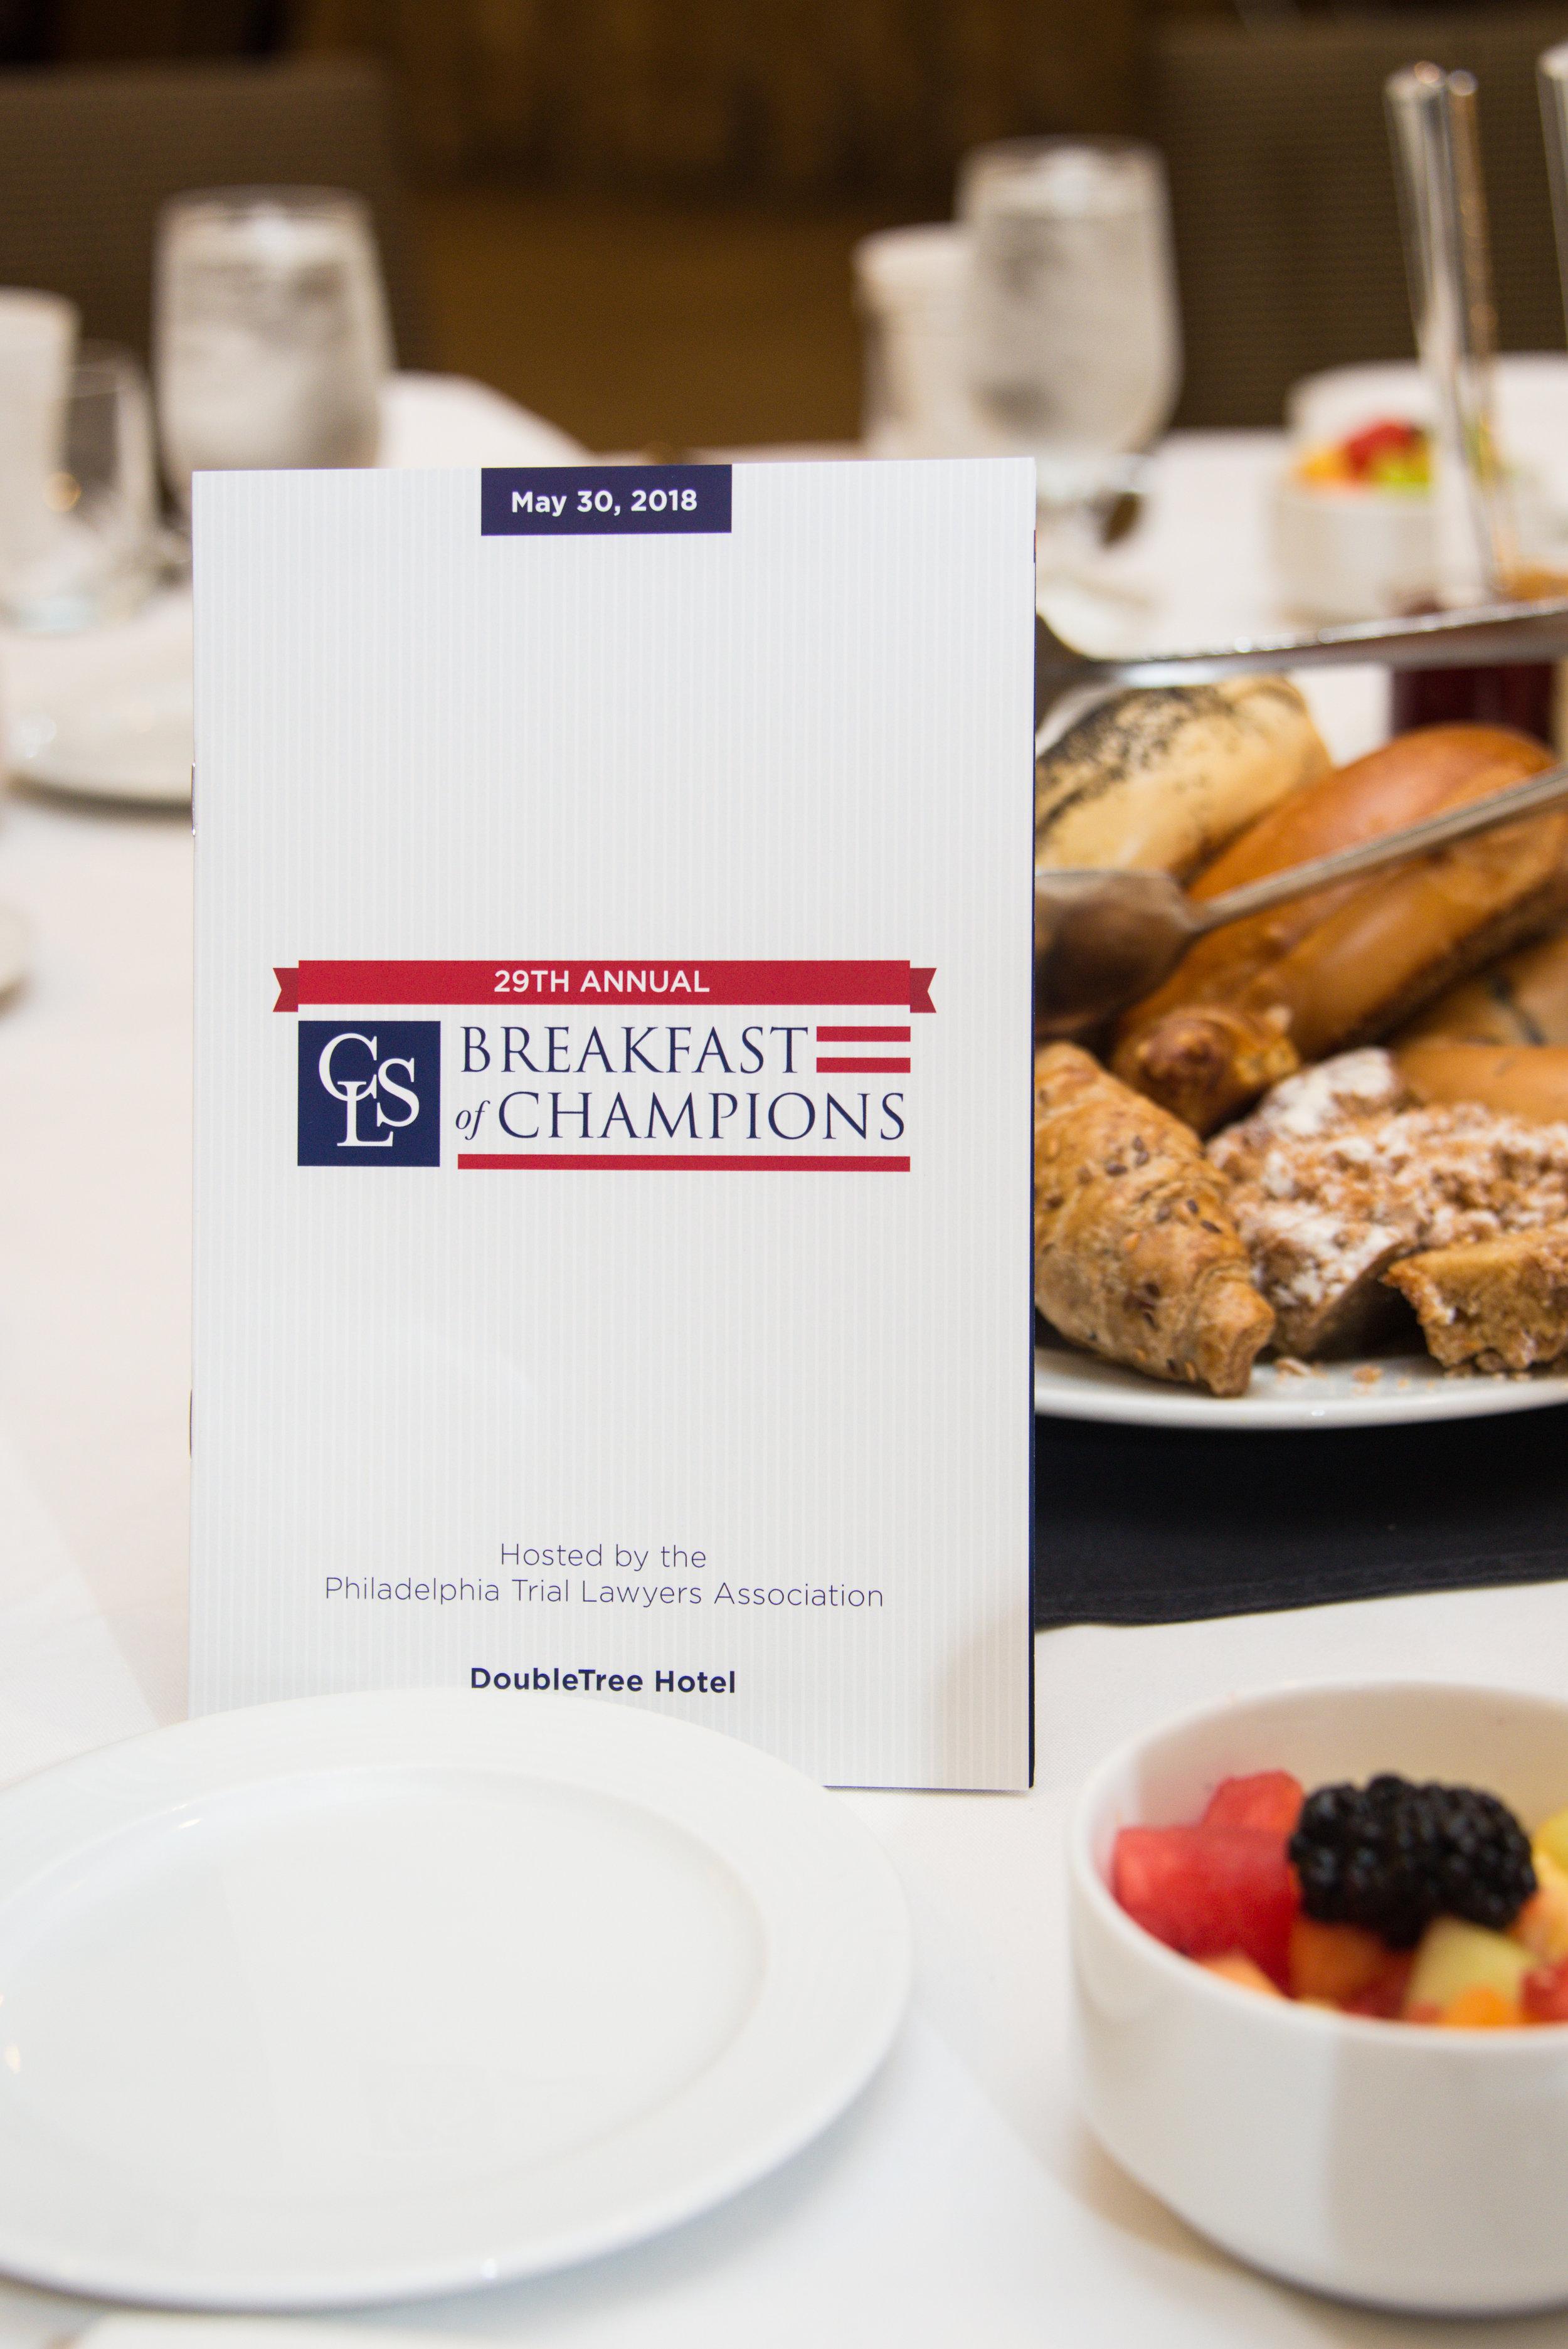 Breakfast of Champions-May-30-2018-NIC.OLE Photography -6.jpg